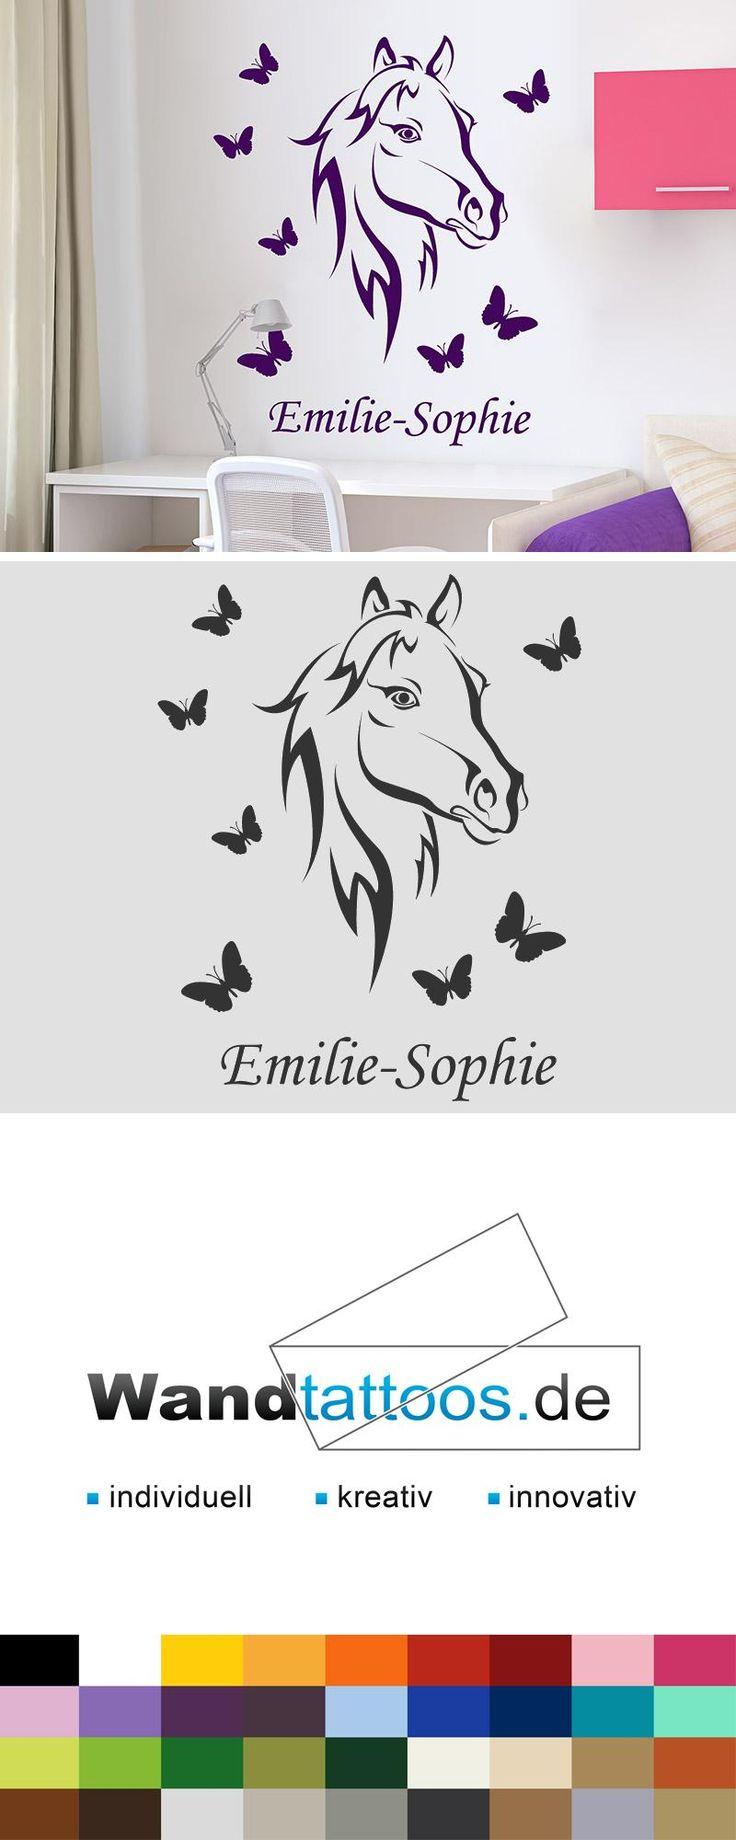 Simple Wandtattoo Pferd mit Wunschname Pferdekopf